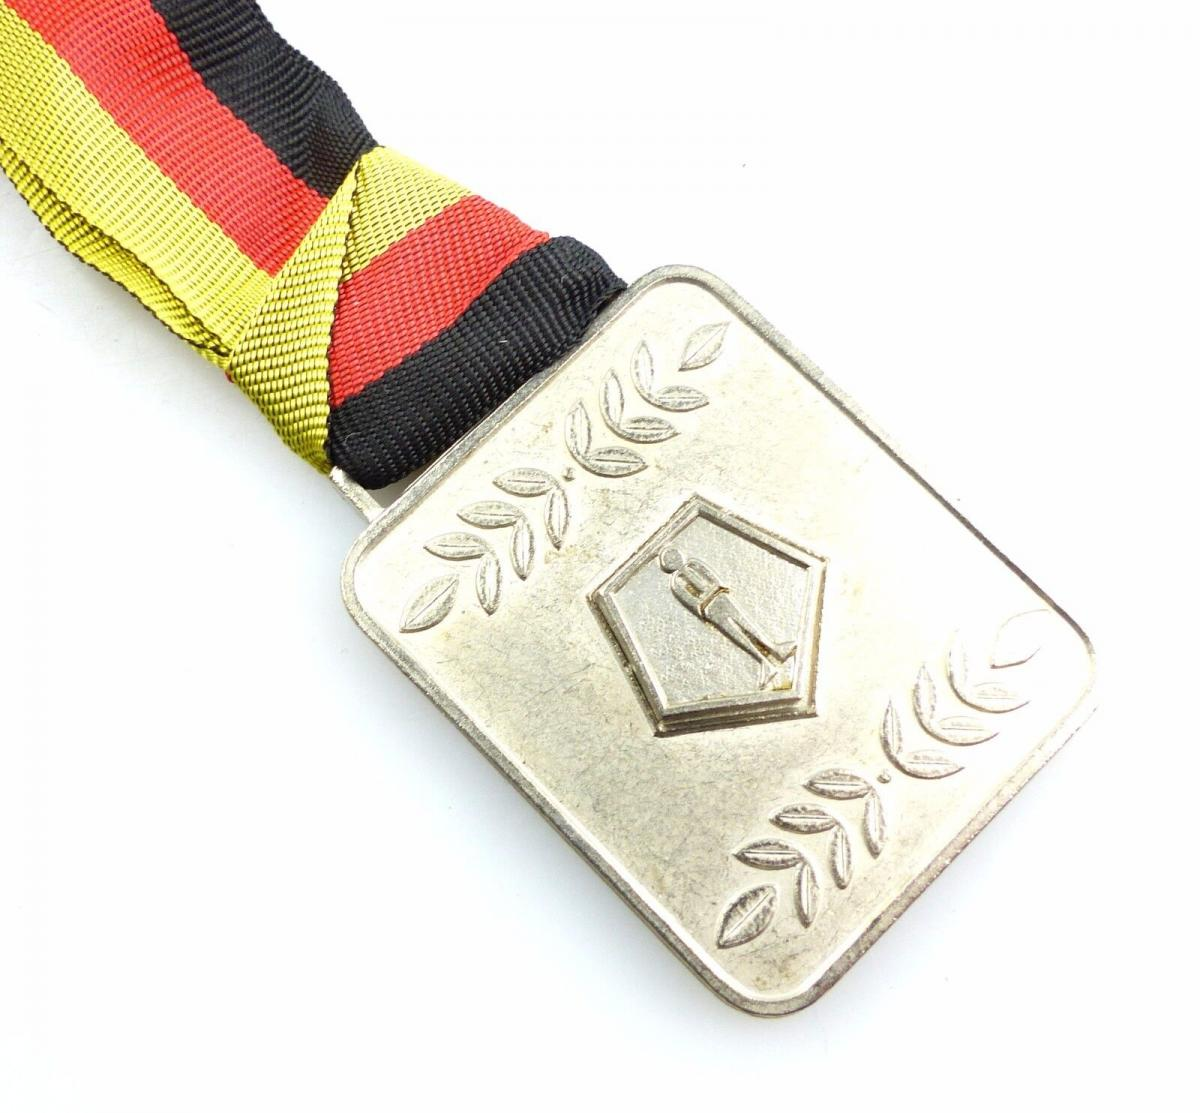 #e5544 DDR Medaille in Silber Bezirksvorstand Magdeburg GST